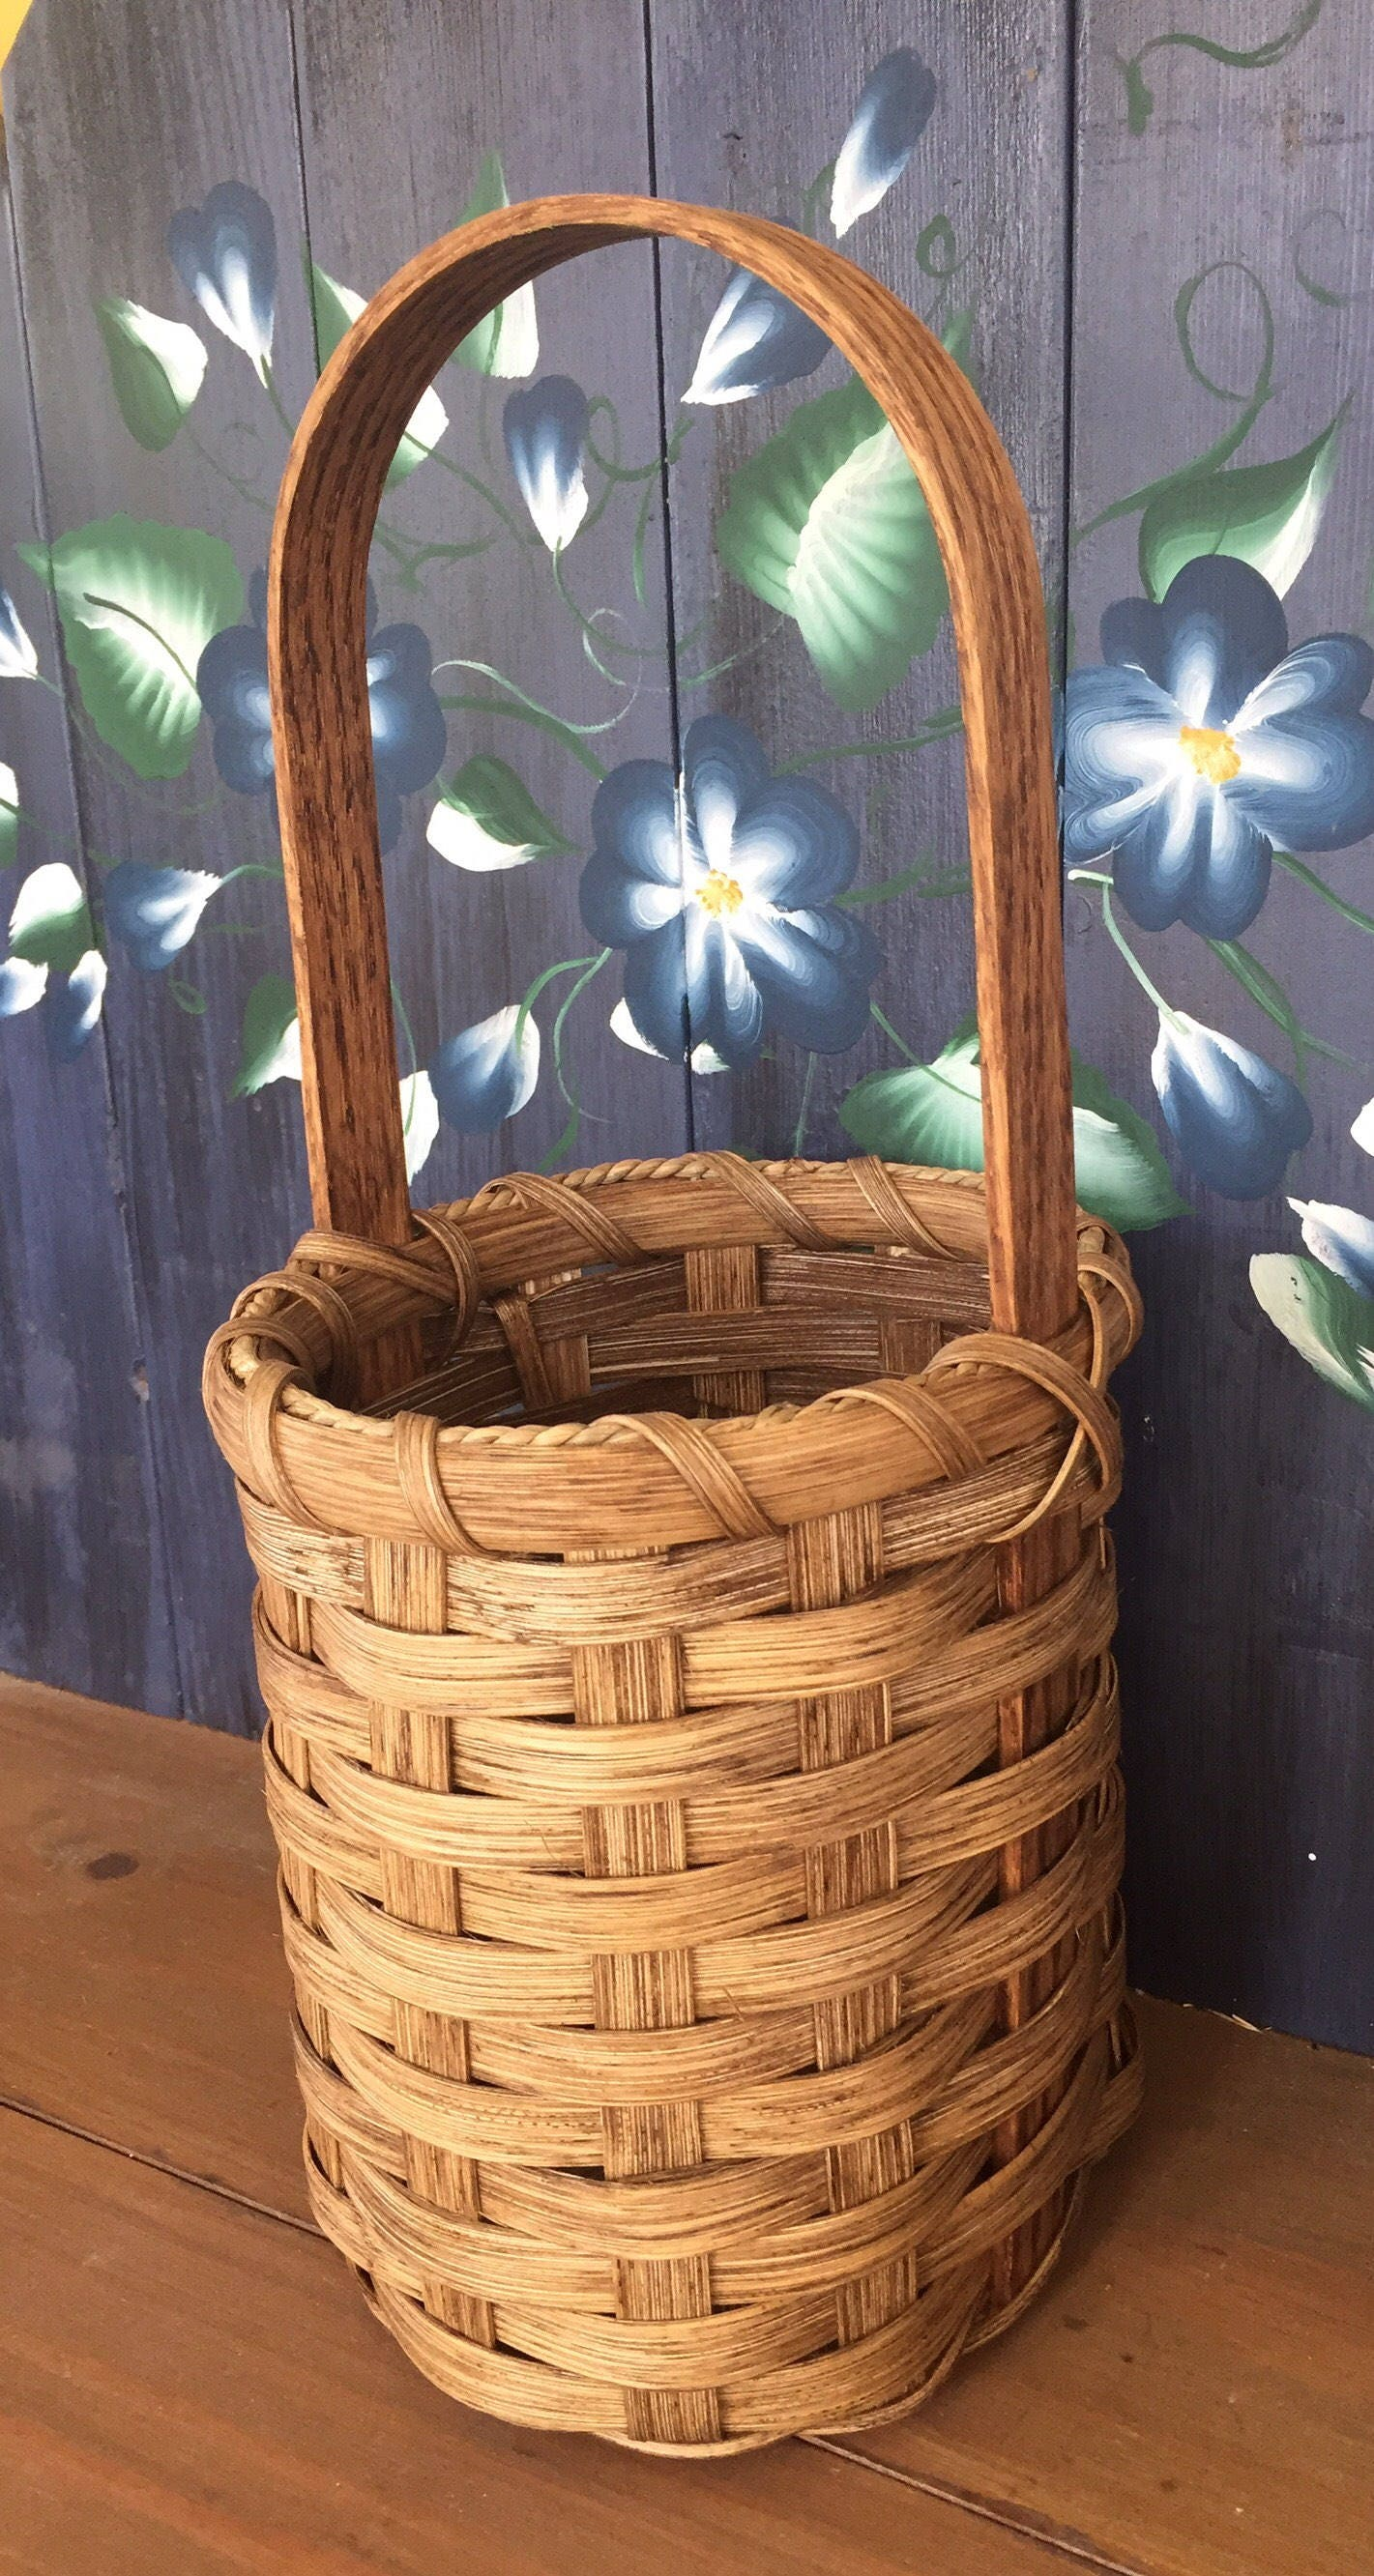 Handmade Basket Gifts : Handmade basket wine gift made in usa